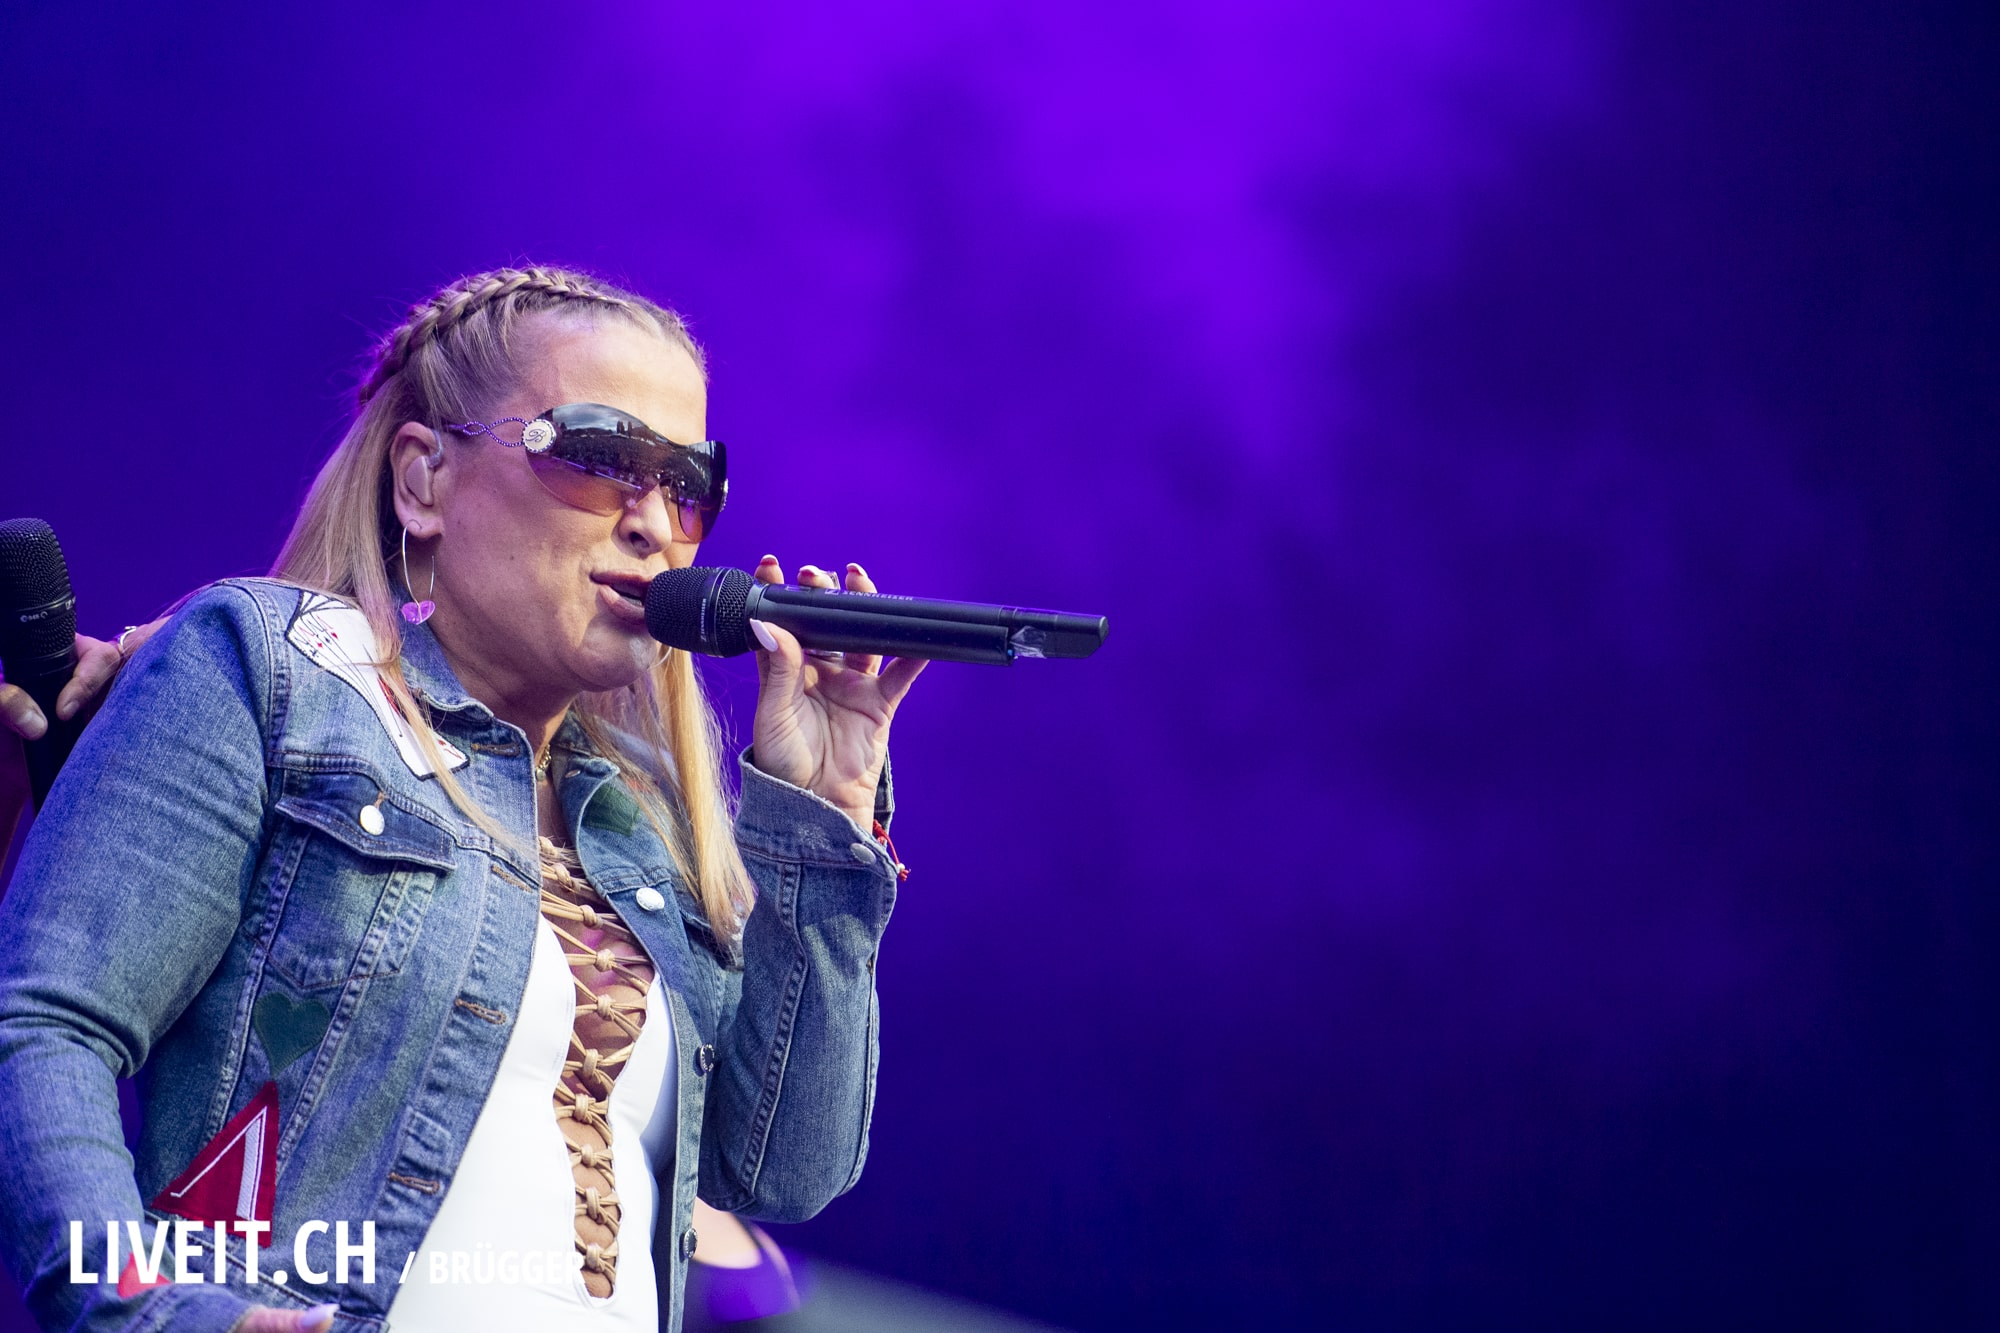 Anastacia fotografiert am Seaside Festival 2018. (Dominic Bruegger for liveit.ch)